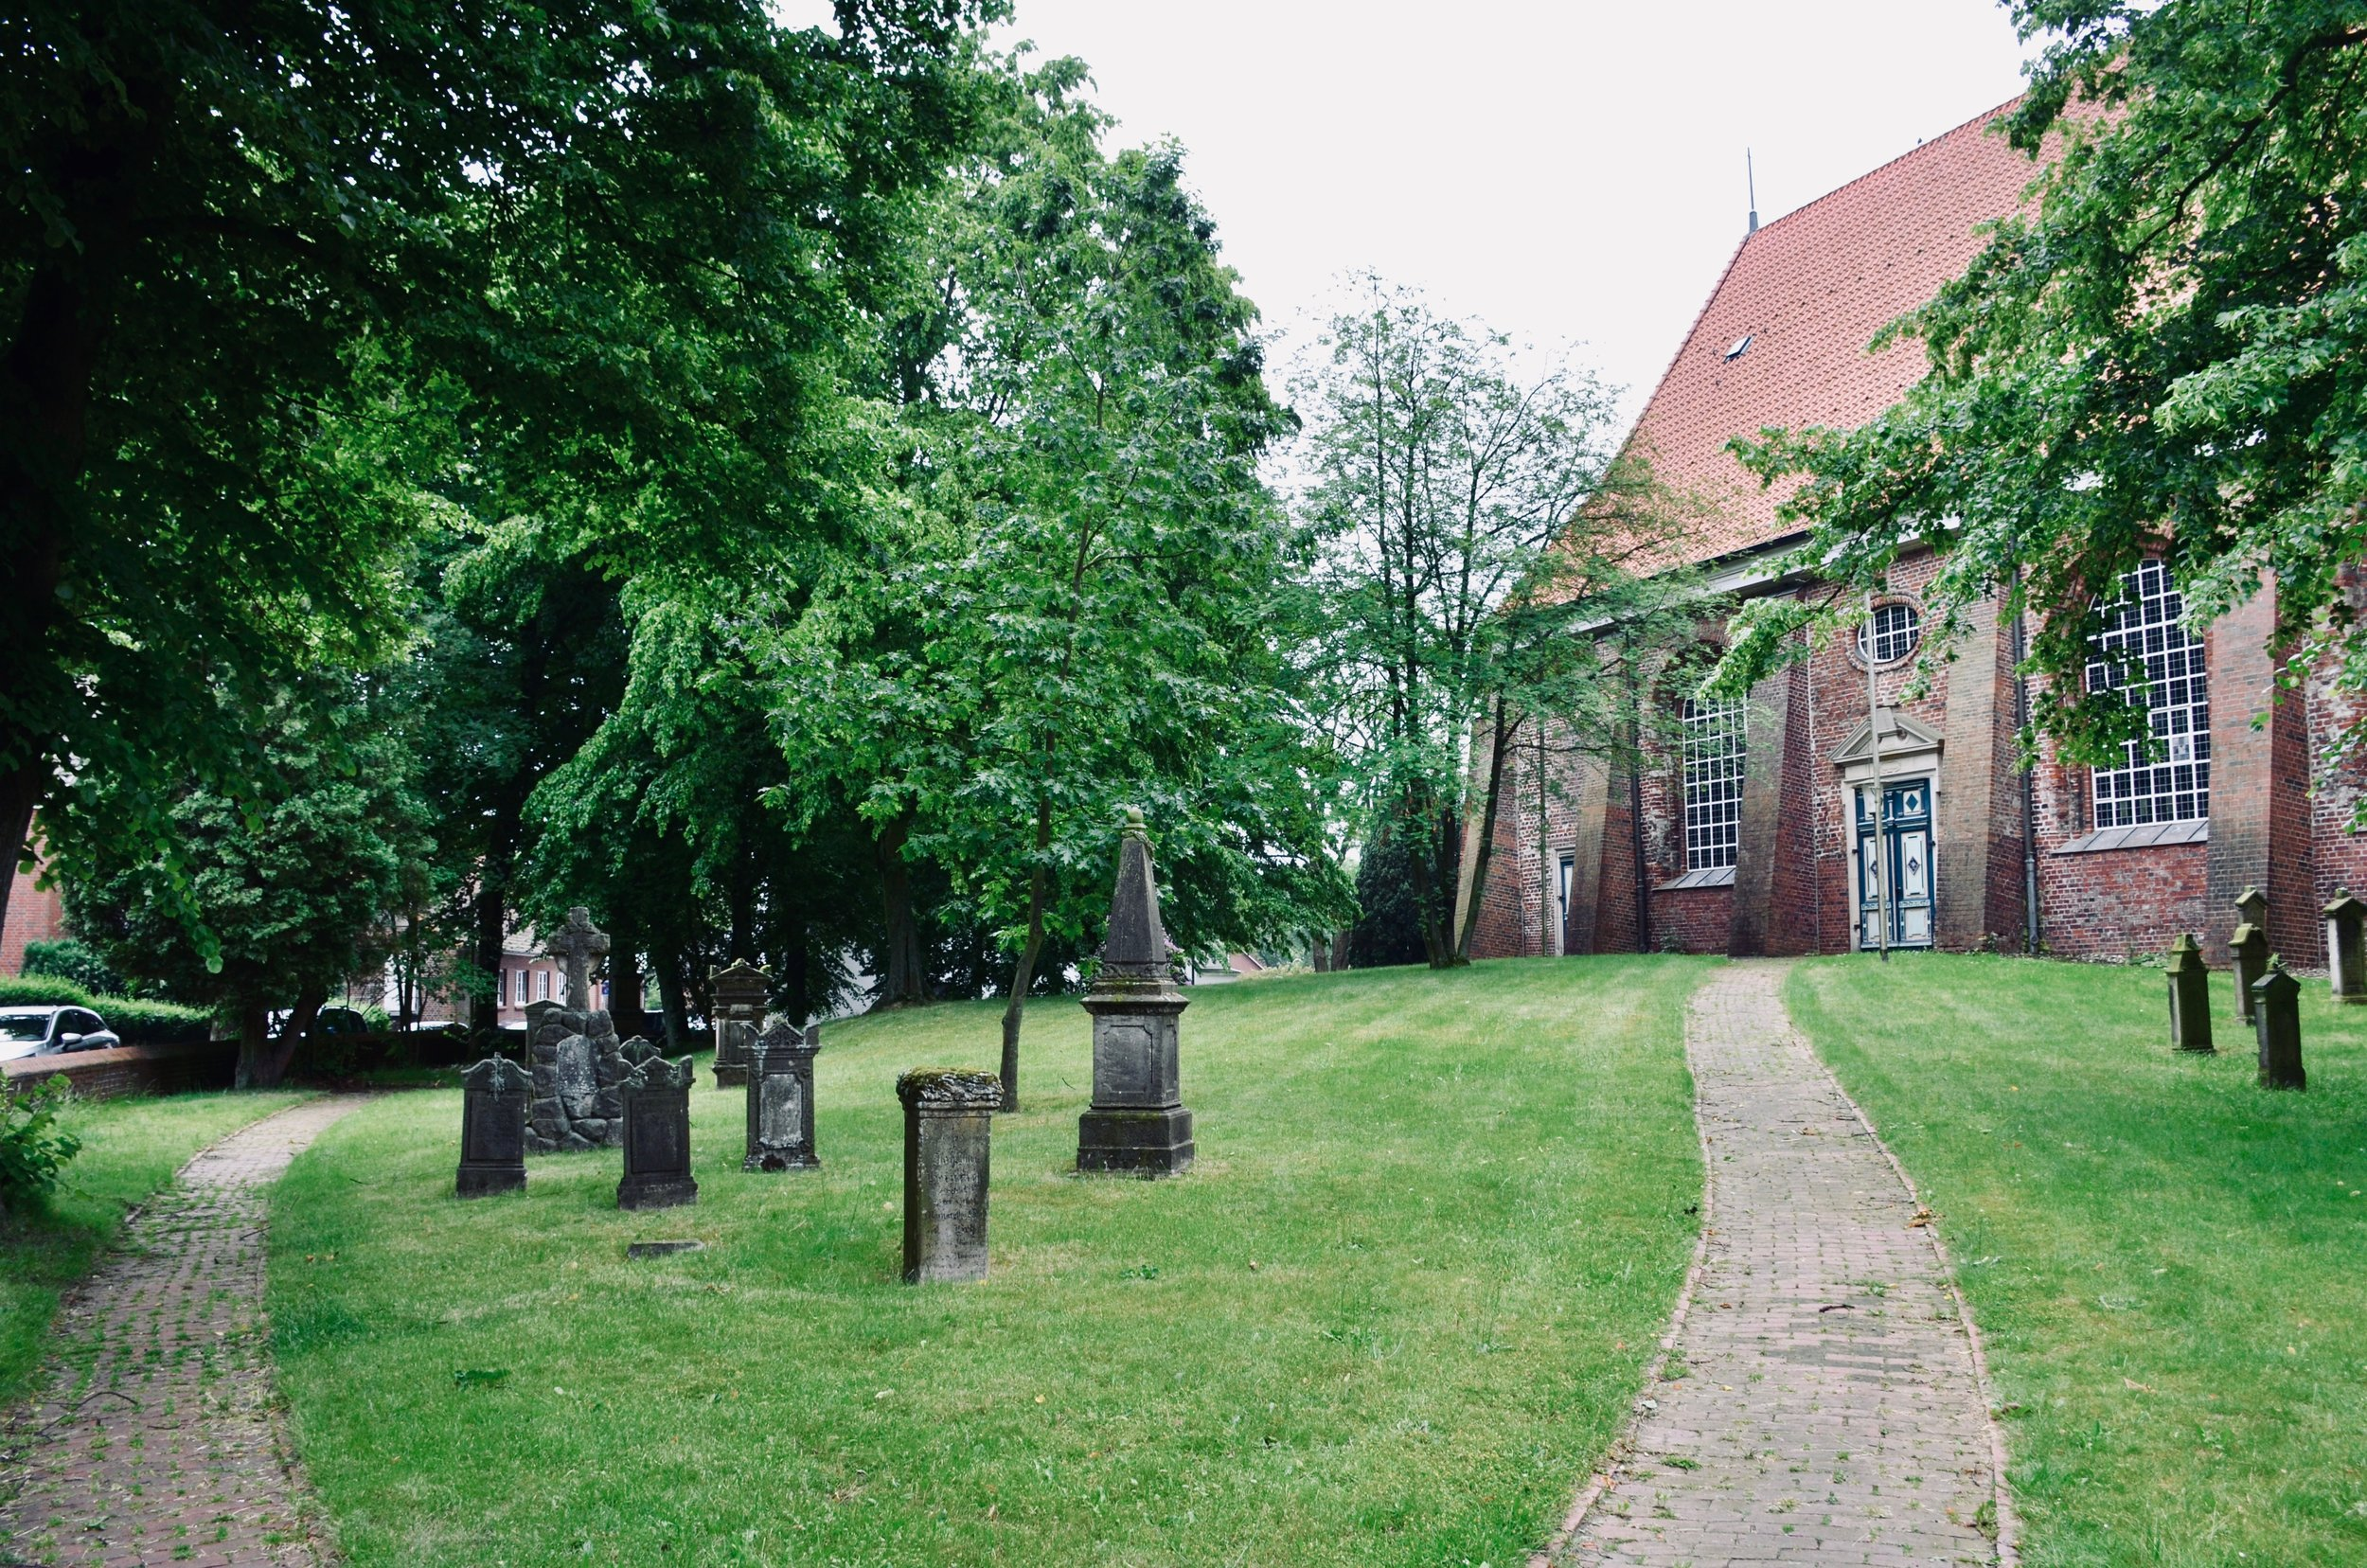 St. Pankratius, Neuenfelde, Germany. Boston Organ Studio.